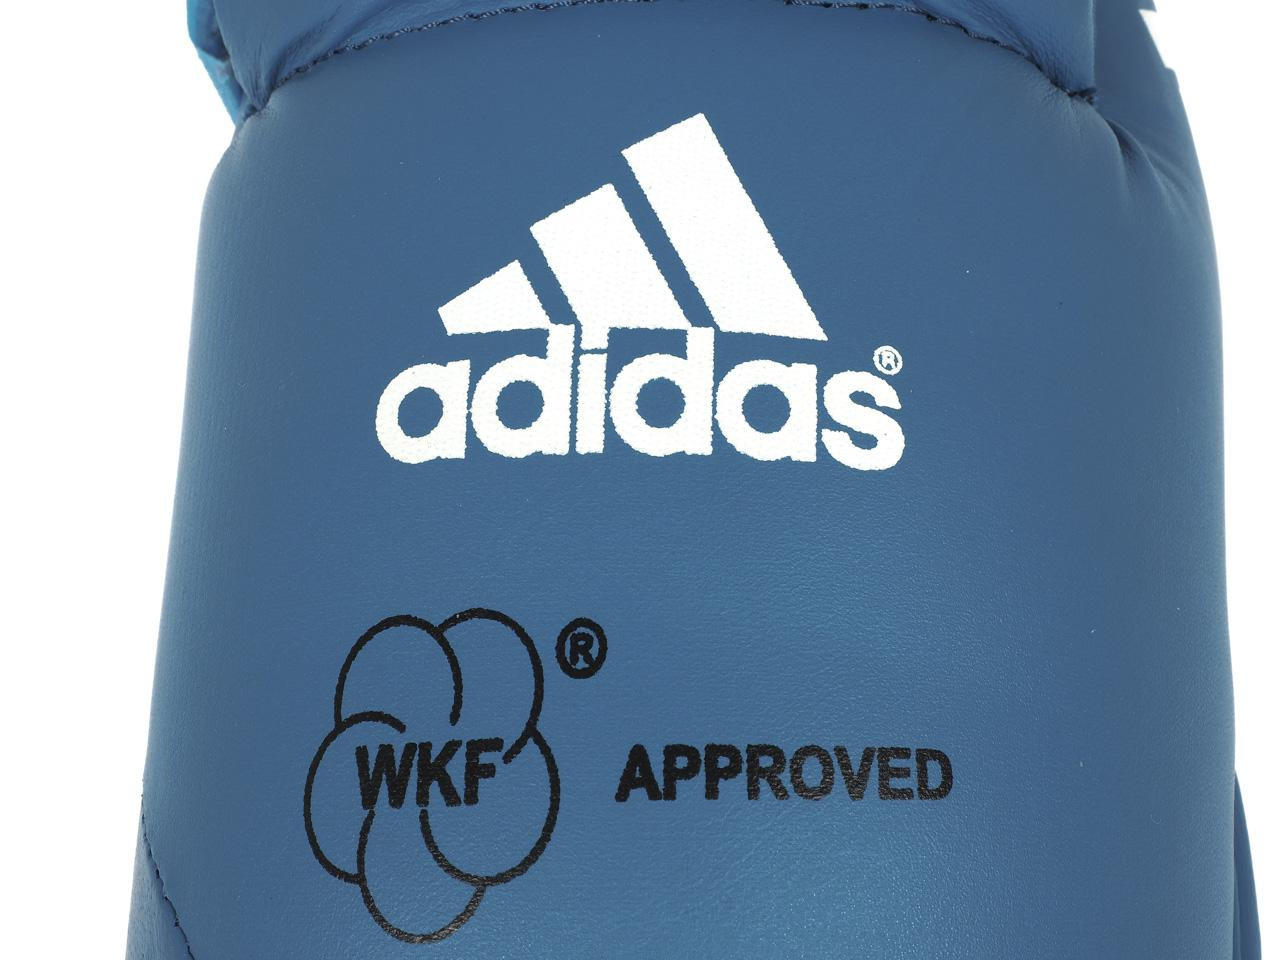 Protects-Feet-Karate-Adidas-Protege-Feet-Blue-Karate-Blue-58599-New thumbnail 2